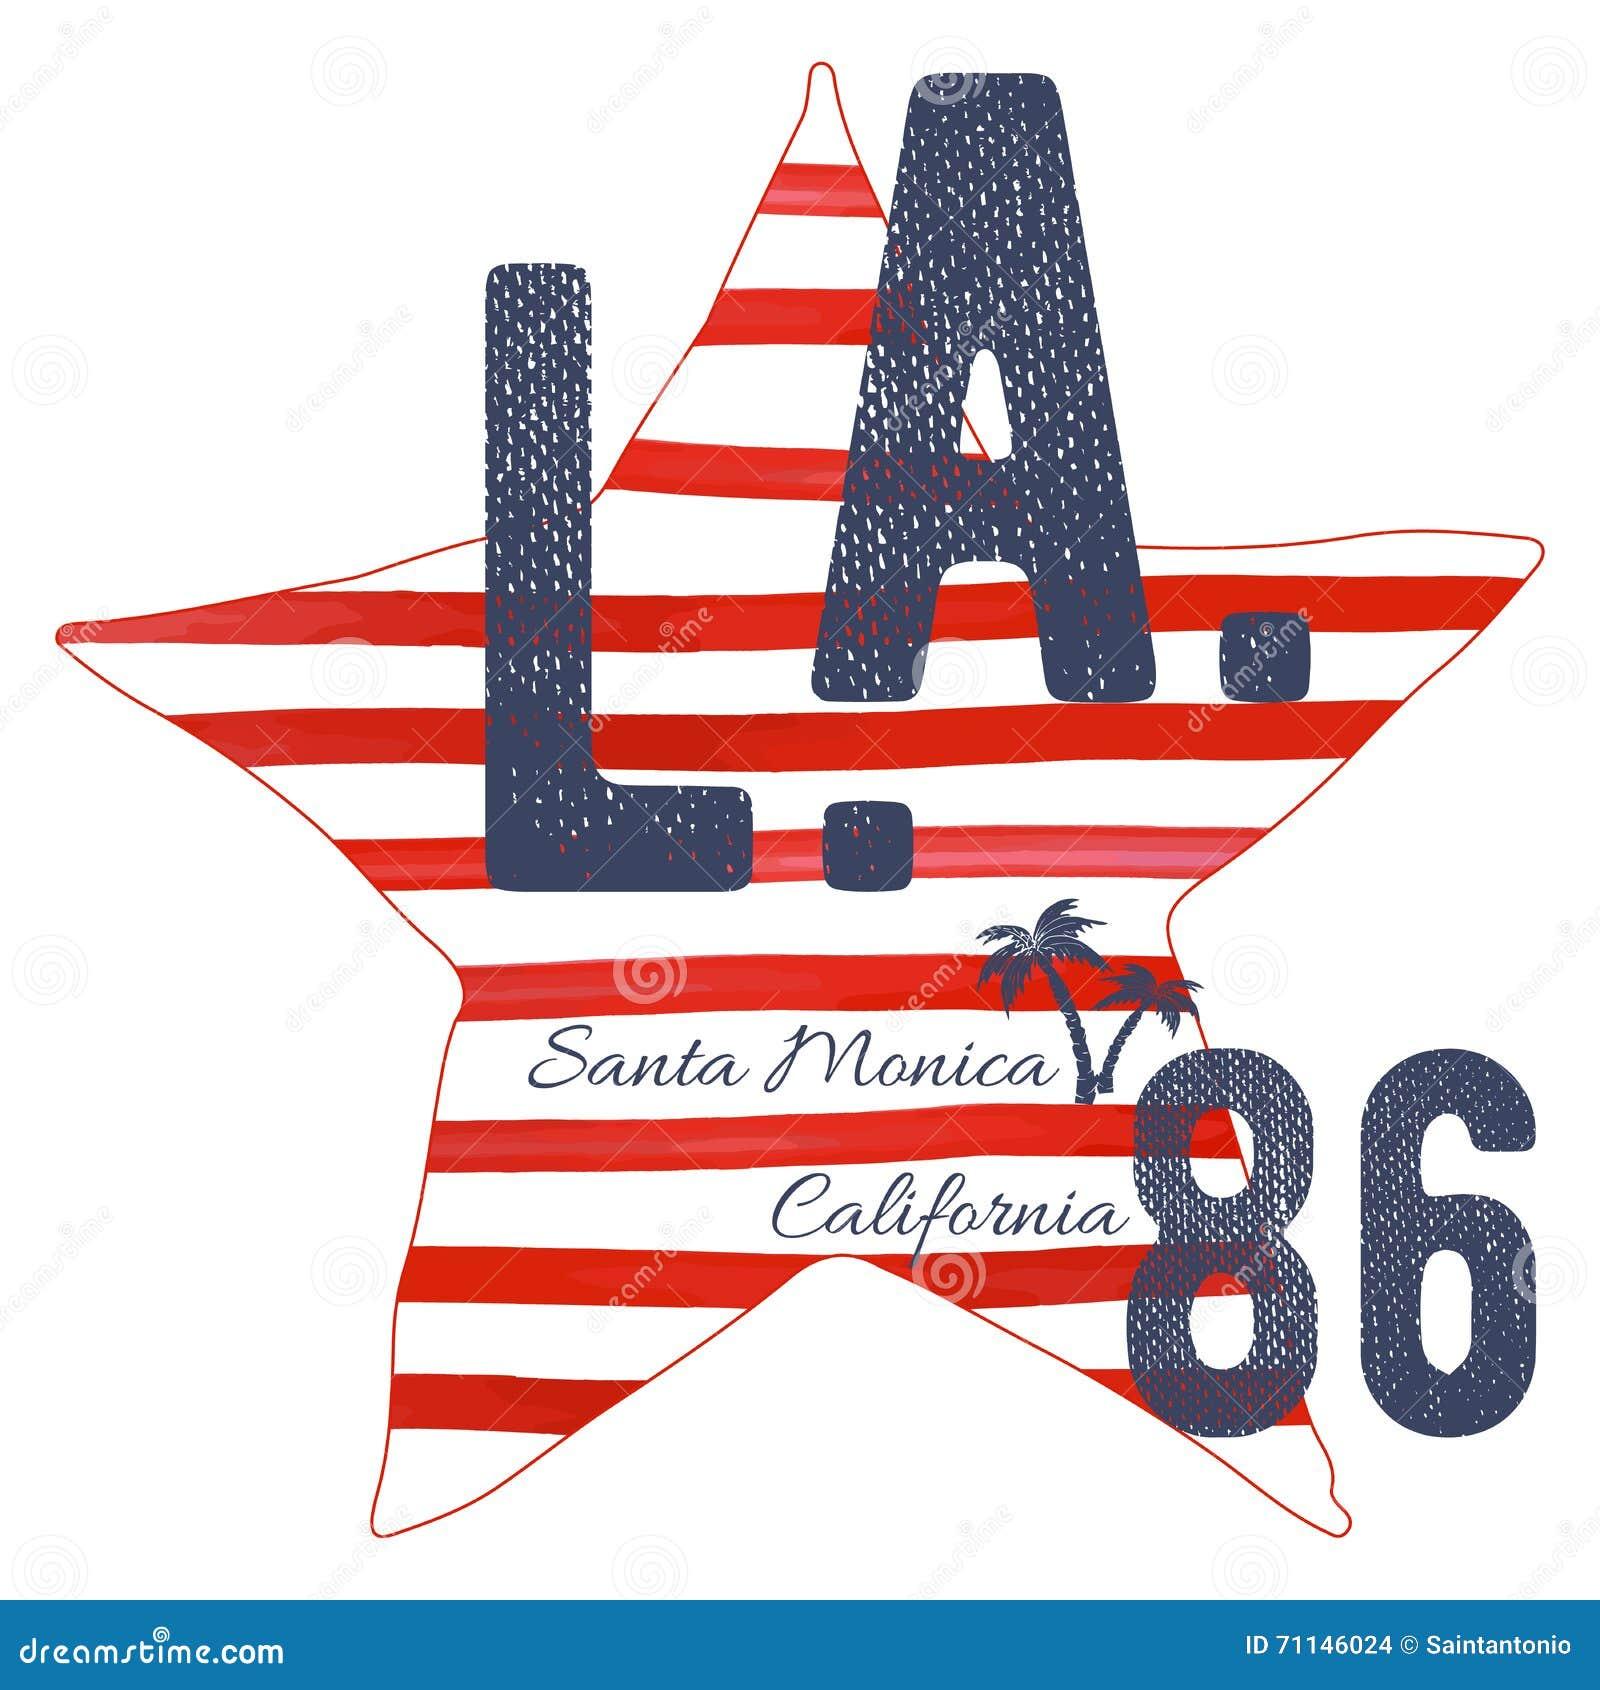 Shirt design los angeles - T Shirt Typography Design La California Santa Monica Beach Printing Graphics Typographic Vector